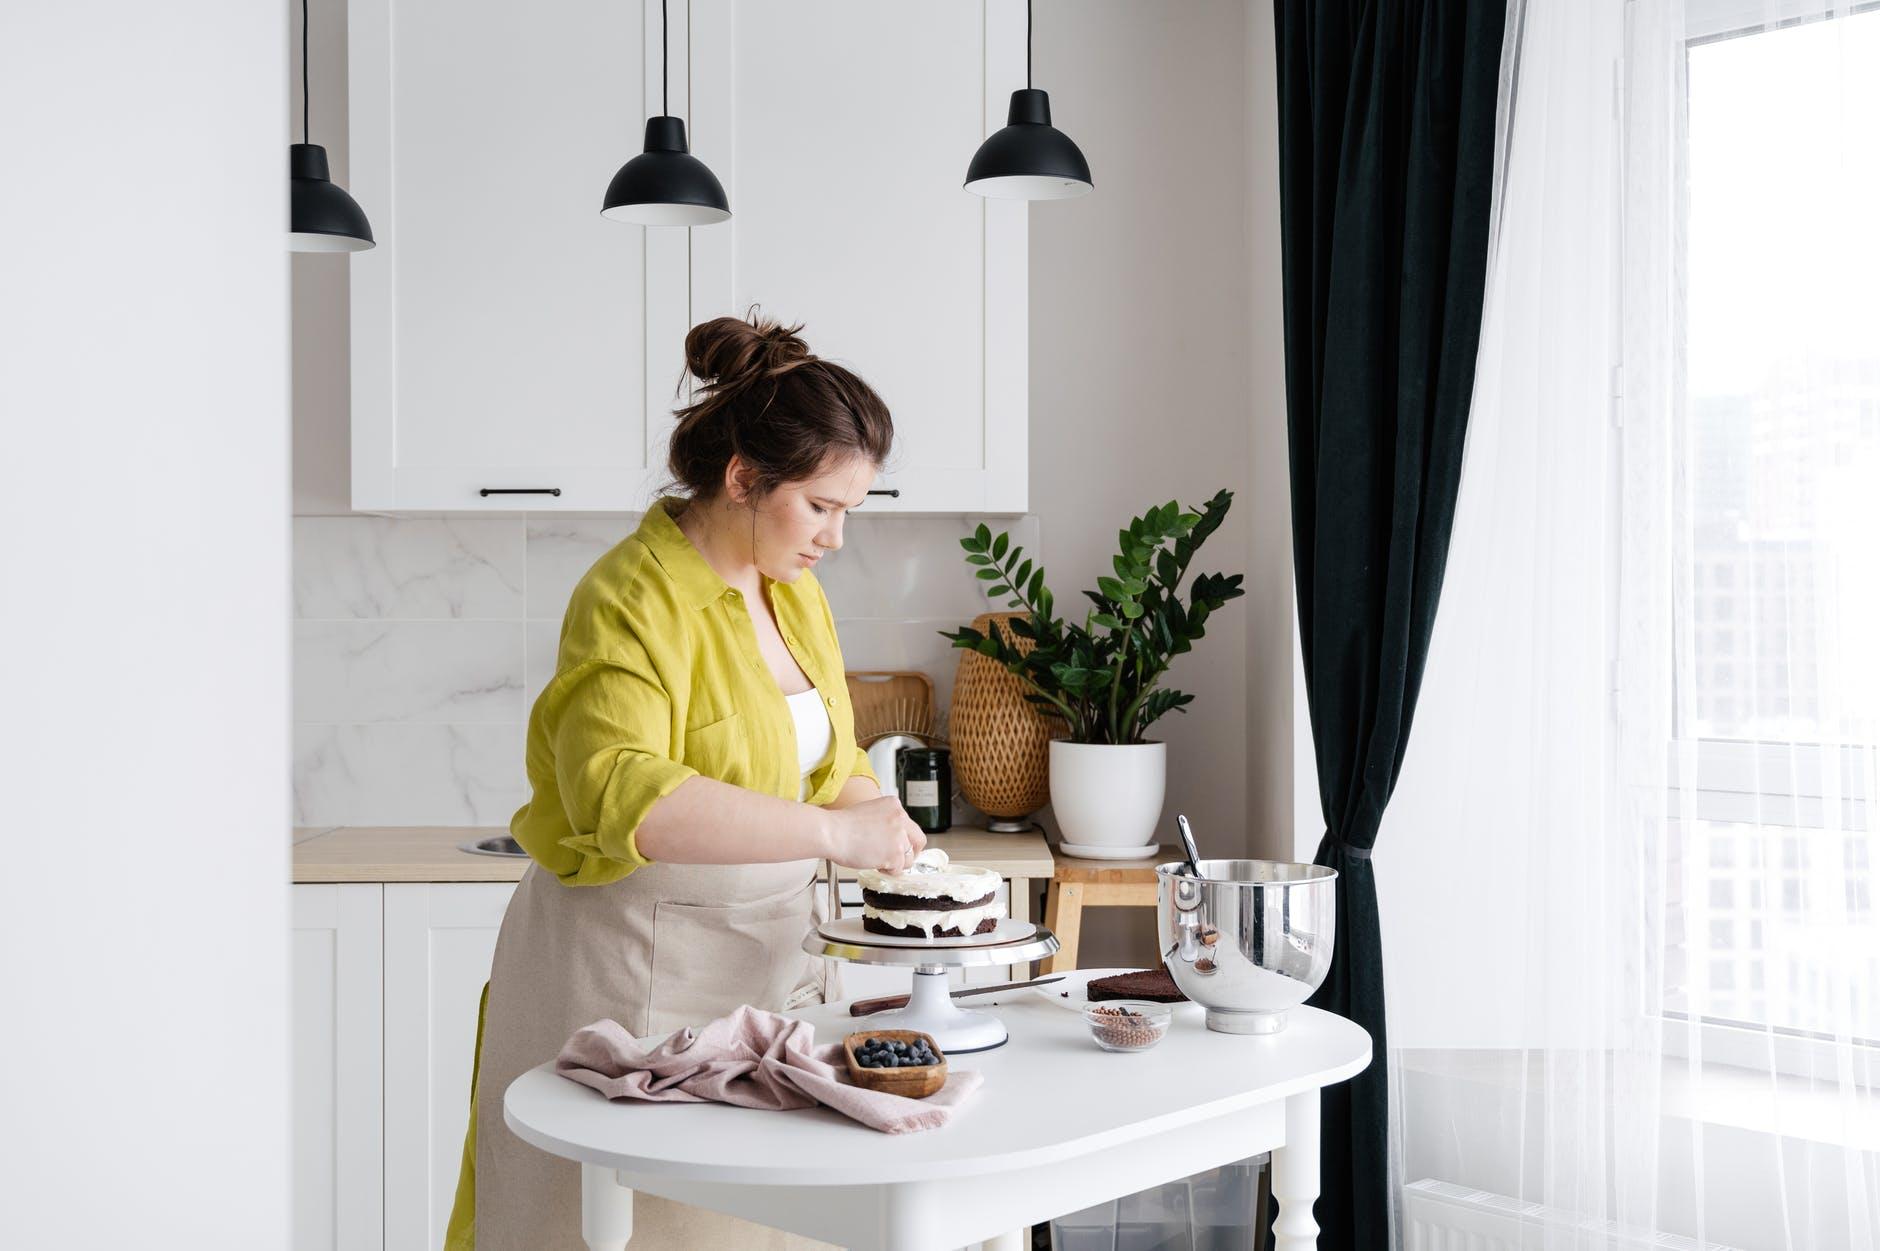 Colberg Baking